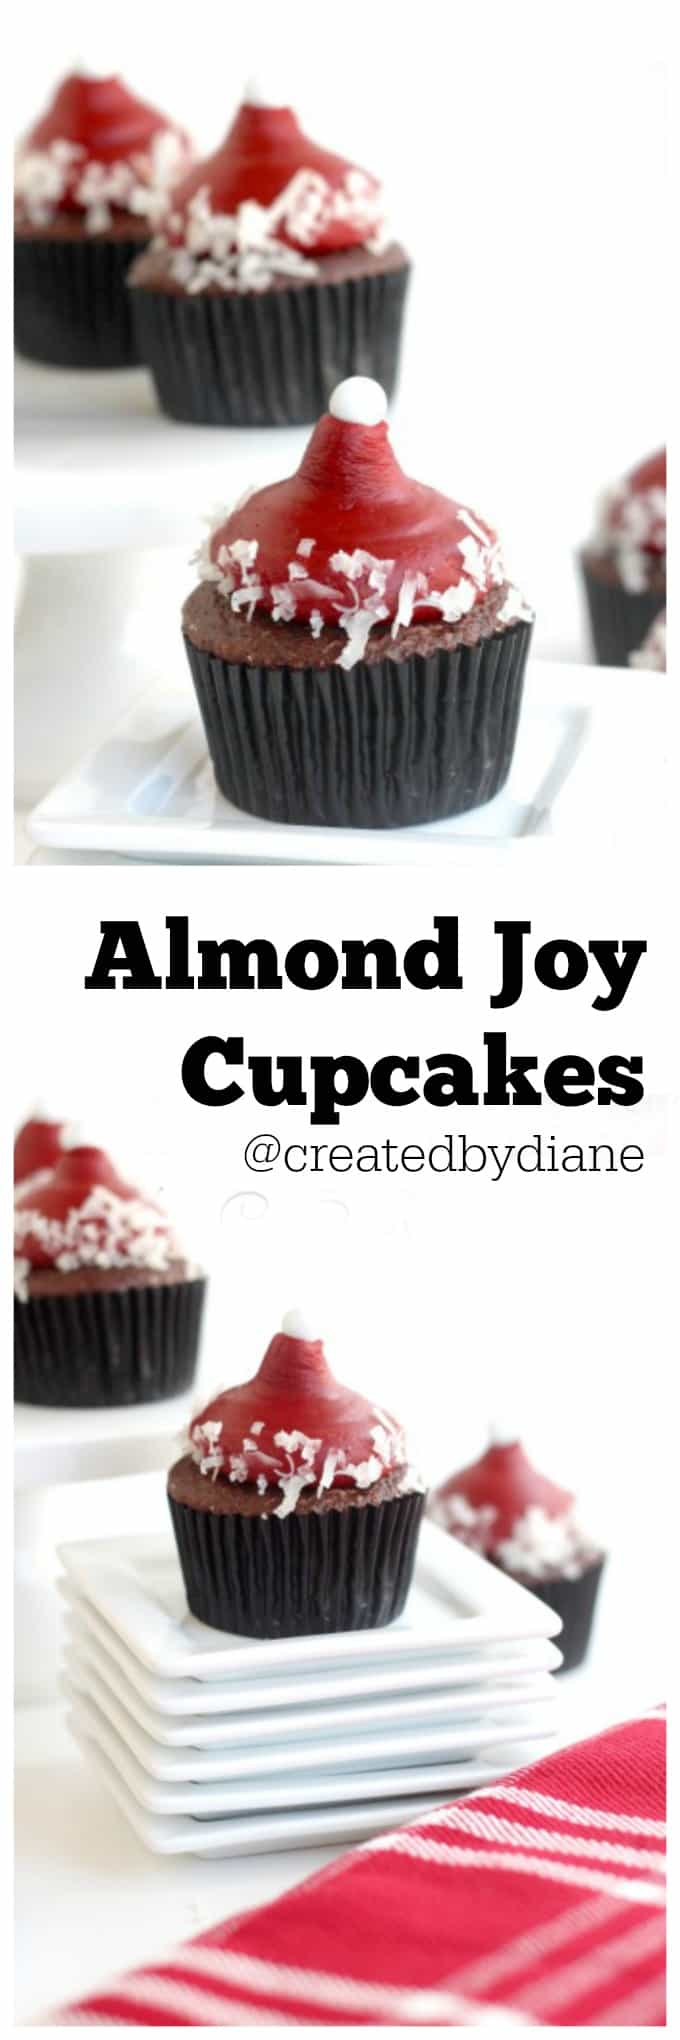 almond joy cupcakes @createdbydiane